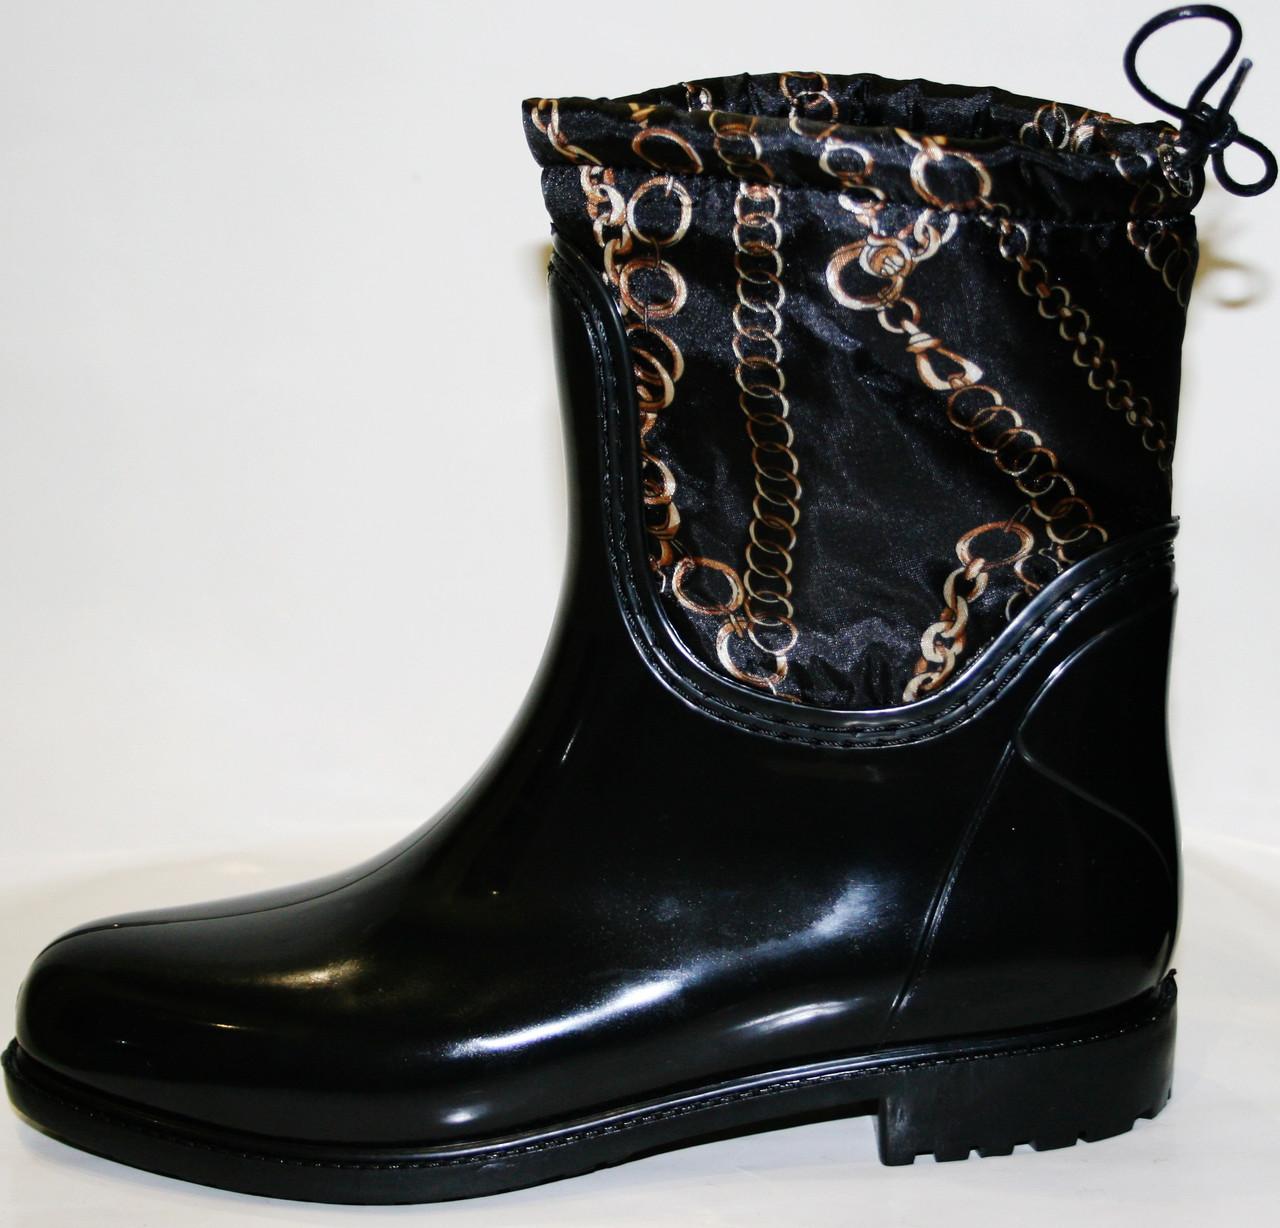 83cd3d803 Резиновые сапоги женские Valex 46112